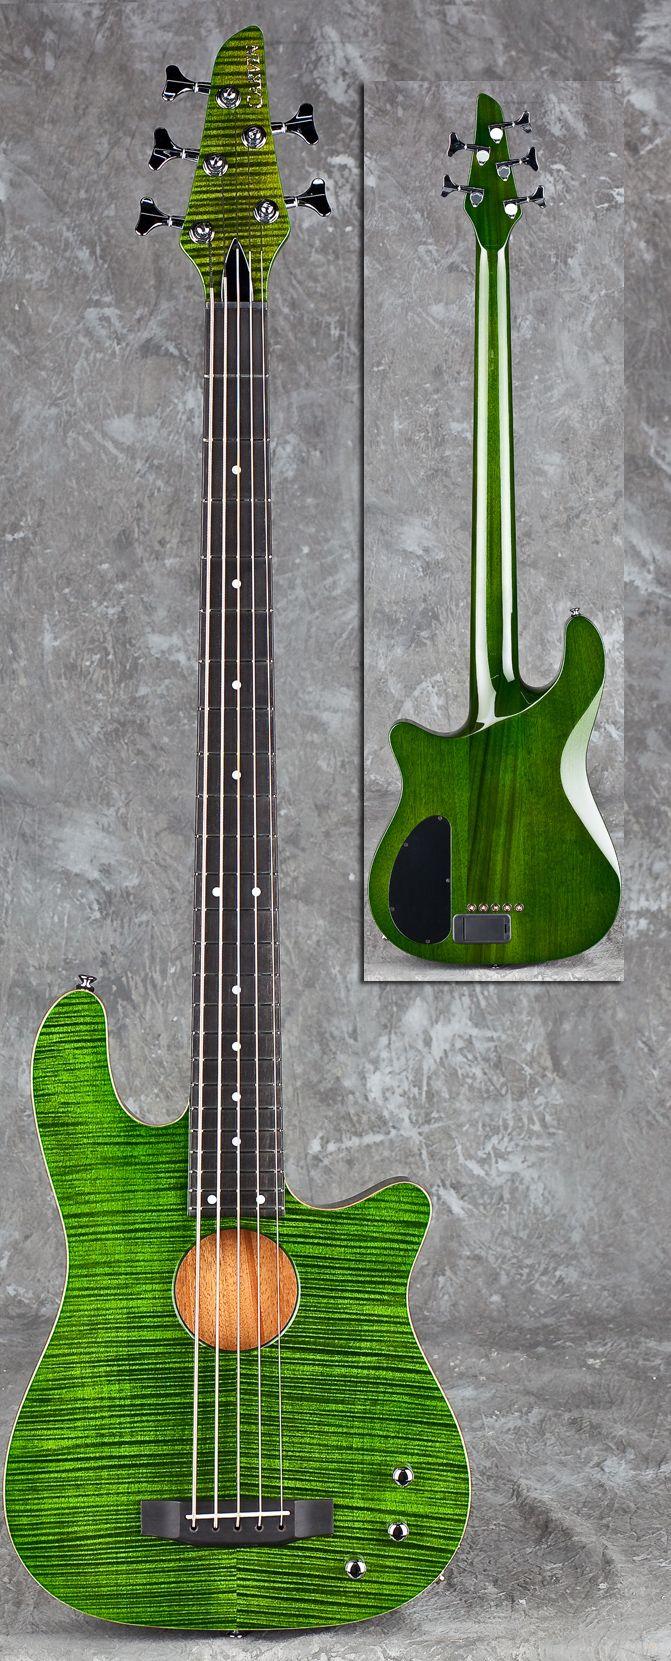 carvin ac50 5 string bass guitar cool bass stuff. Black Bedroom Furniture Sets. Home Design Ideas